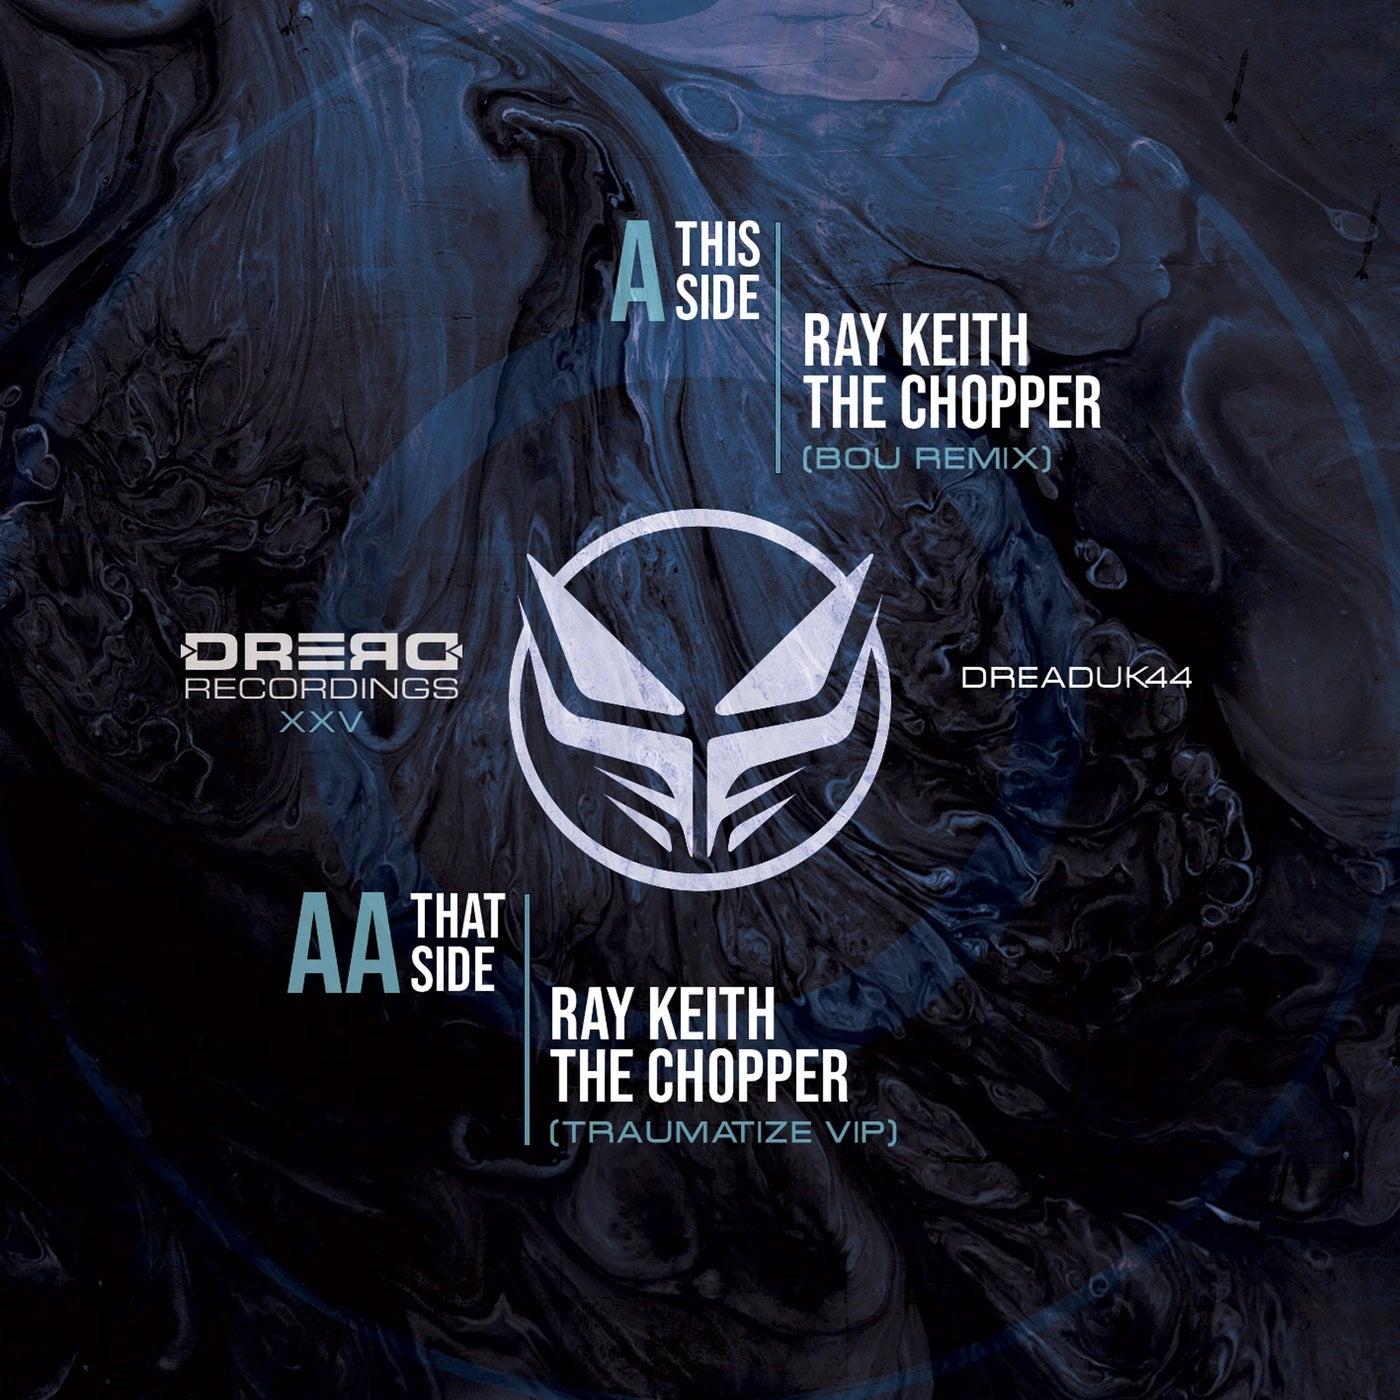 The Chopper (Bou Remix)